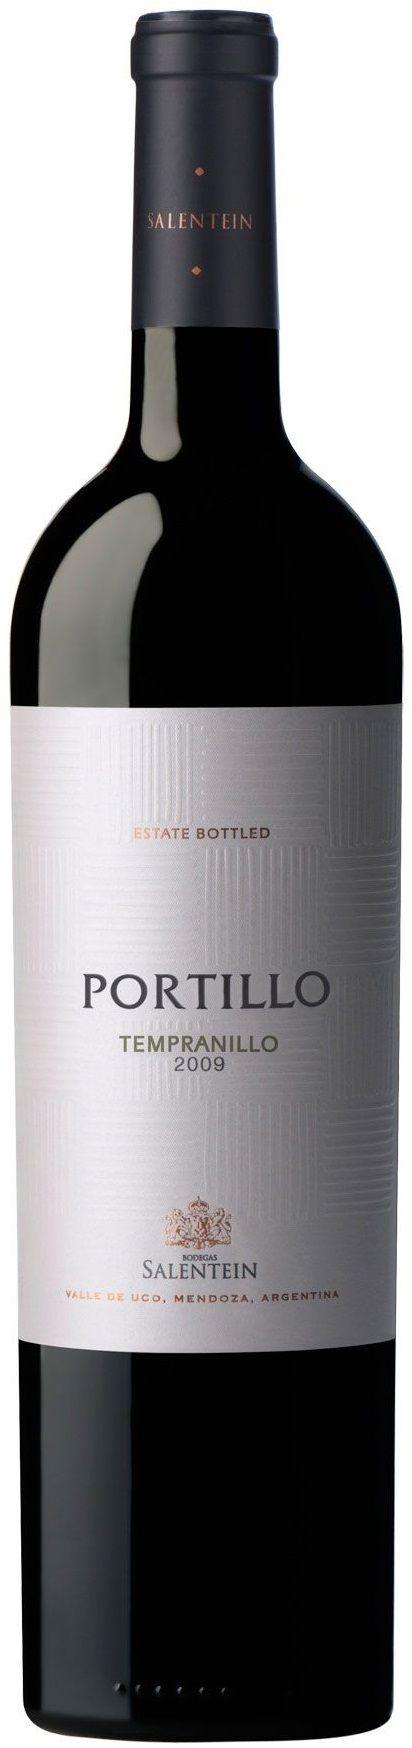 """Portillo"" Tempranillo 2013 - Bodega Salentein, Tunuyán, Mendoza---------------------------------Terroir: Los Arboles (Tunuyán)"